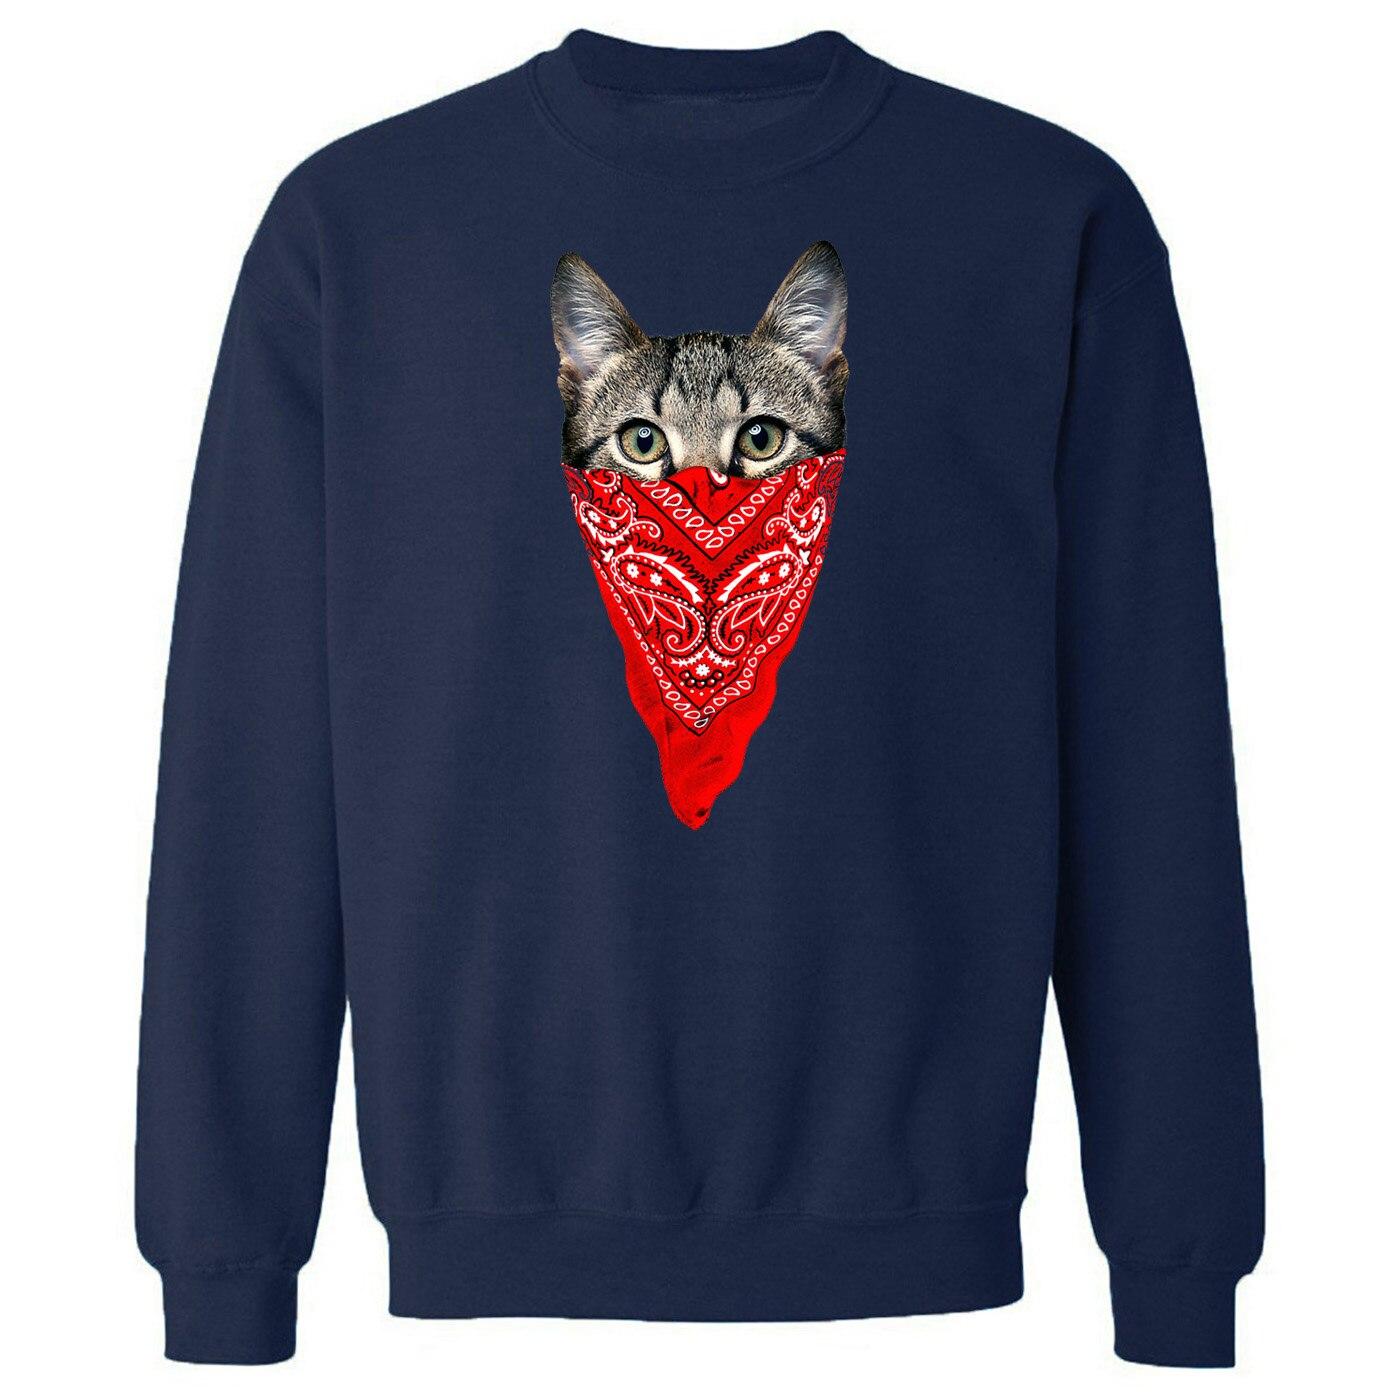 Funny Cat 2019 New Autumn Winter Men Sweatshirts Hip Hop Hoody Cartoon Fashion Harajuku Print Streetwaer Leisure Long Sleeve